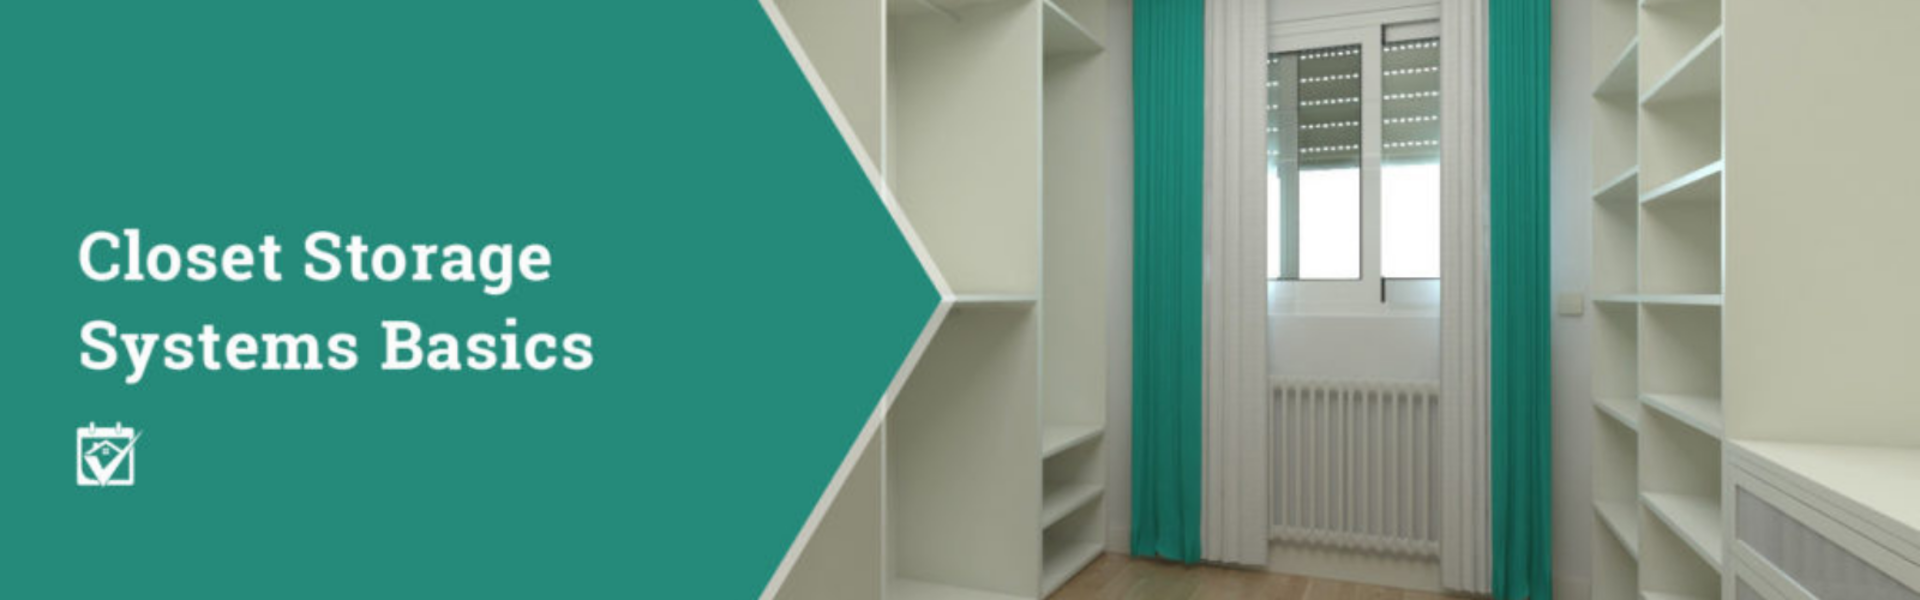 Closet Storage Systems Basics